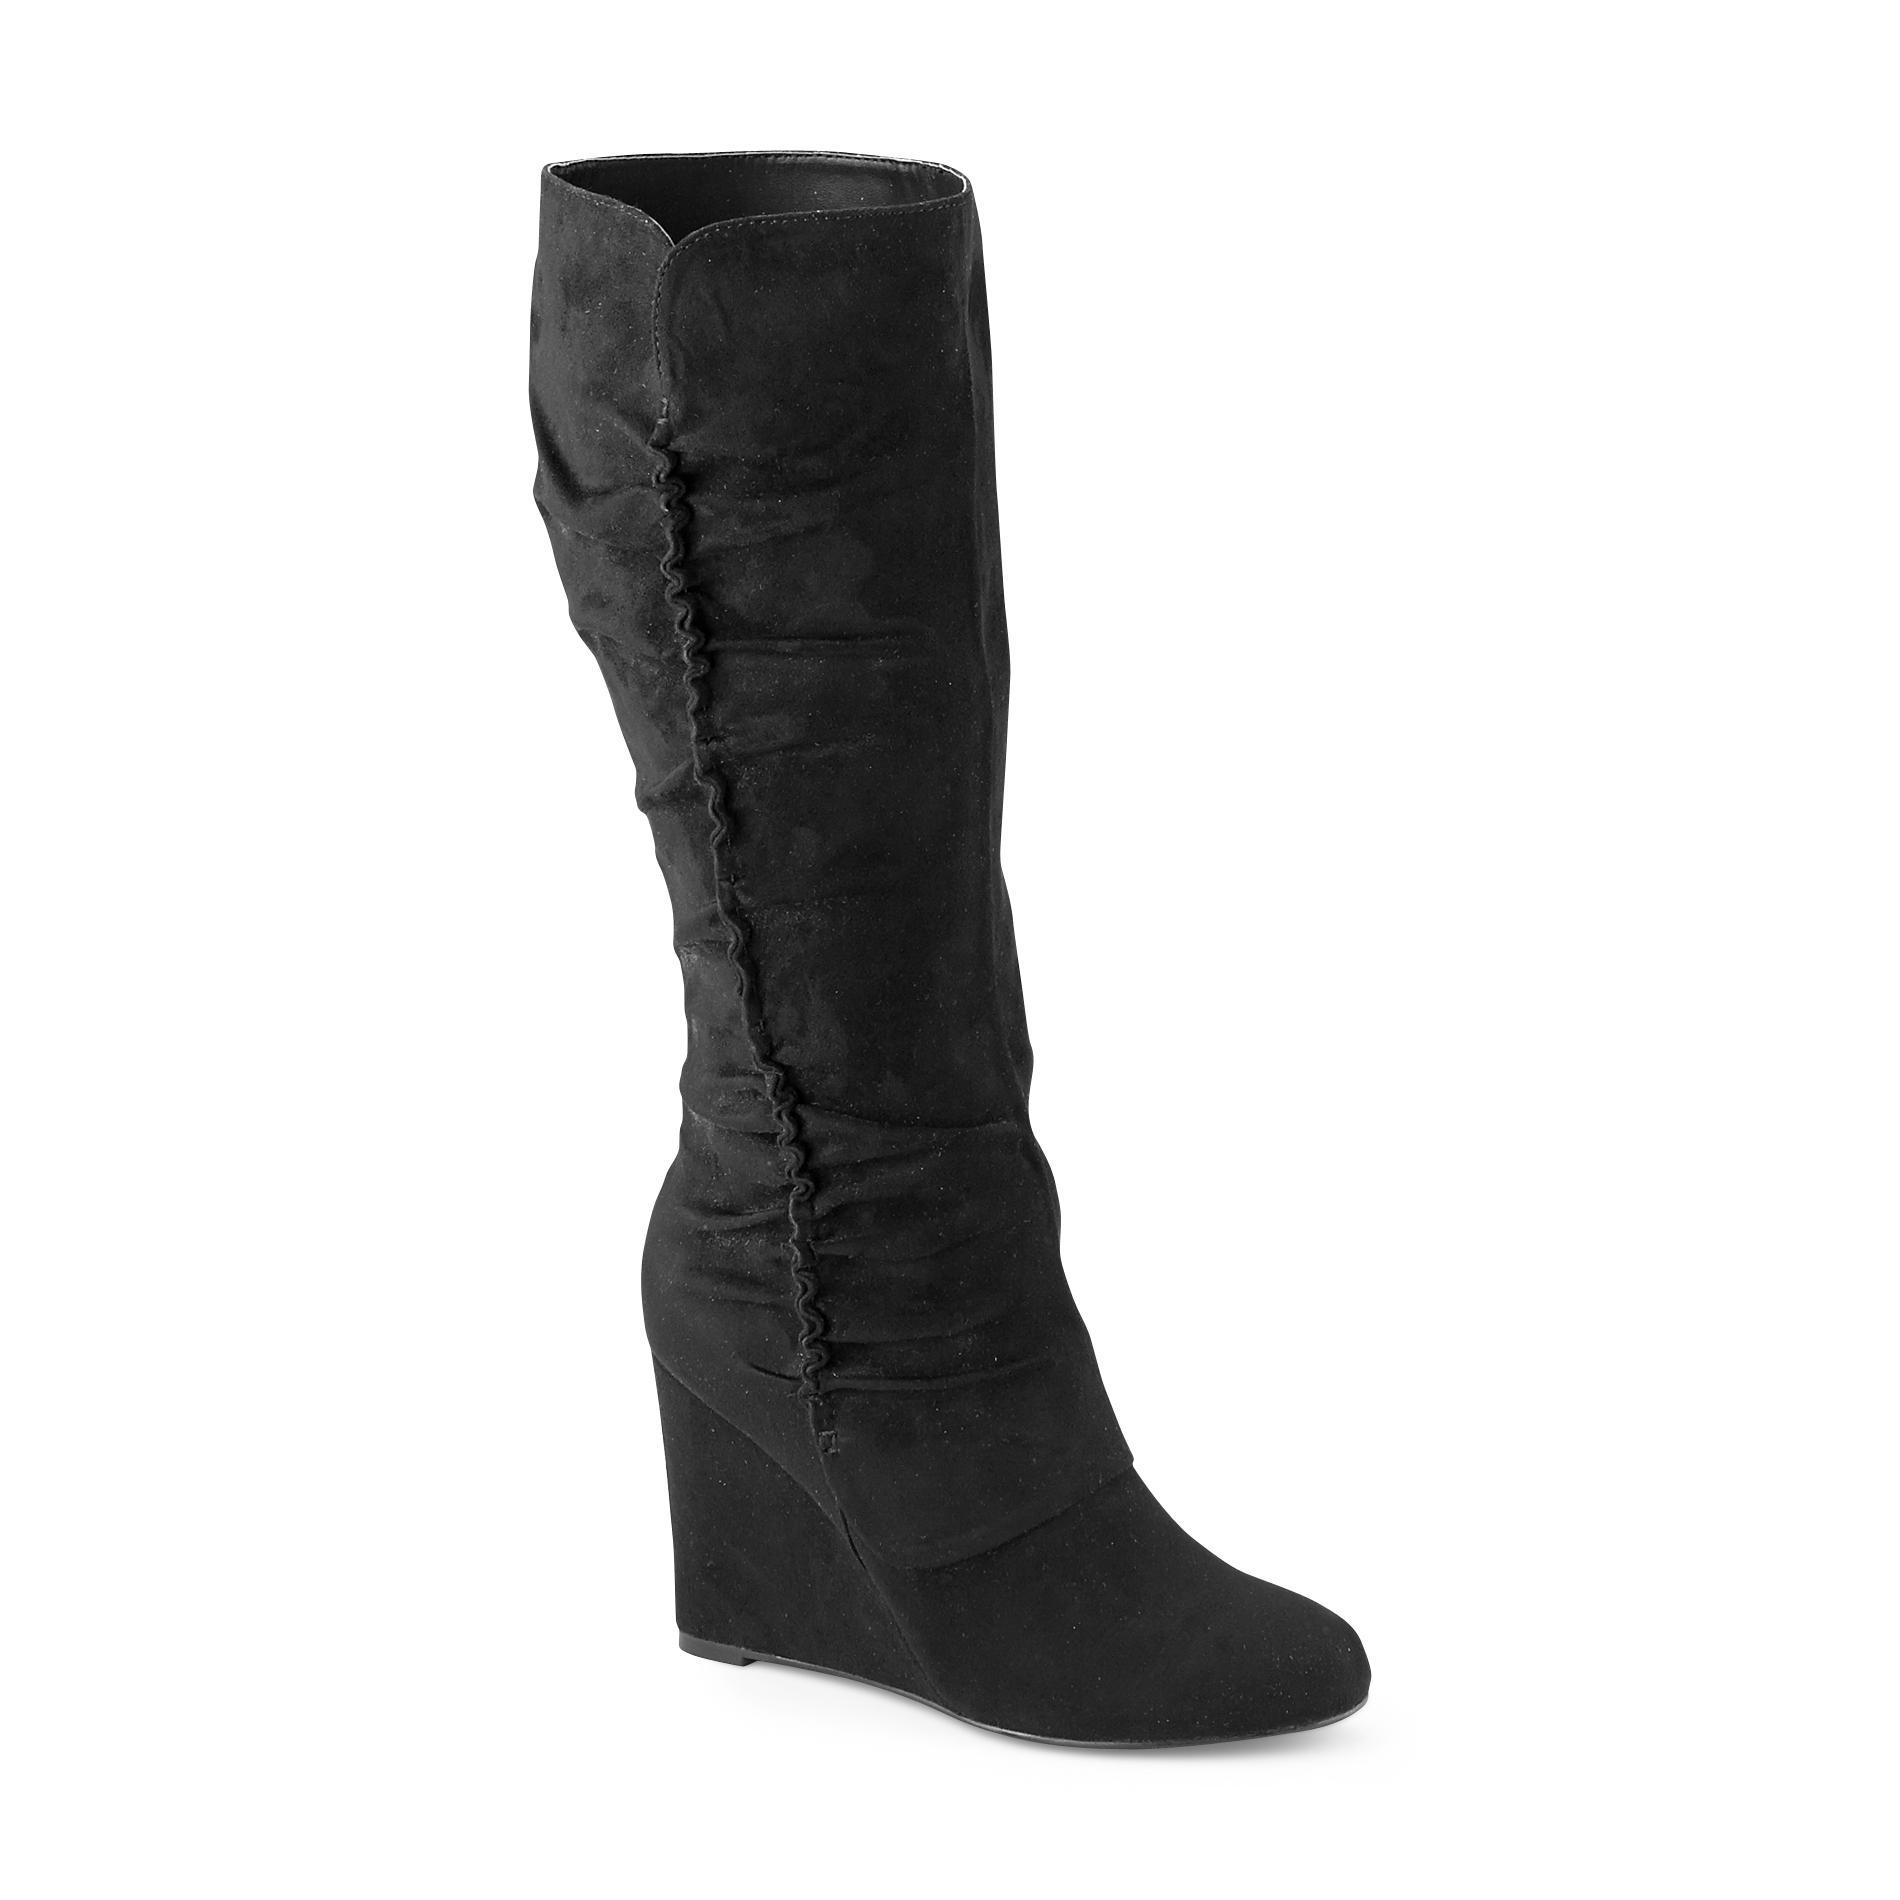 black wedge boots mia amore womenu0027s adyson wedge boot - black - shoes - womenu0027s shoes - HILTYXB